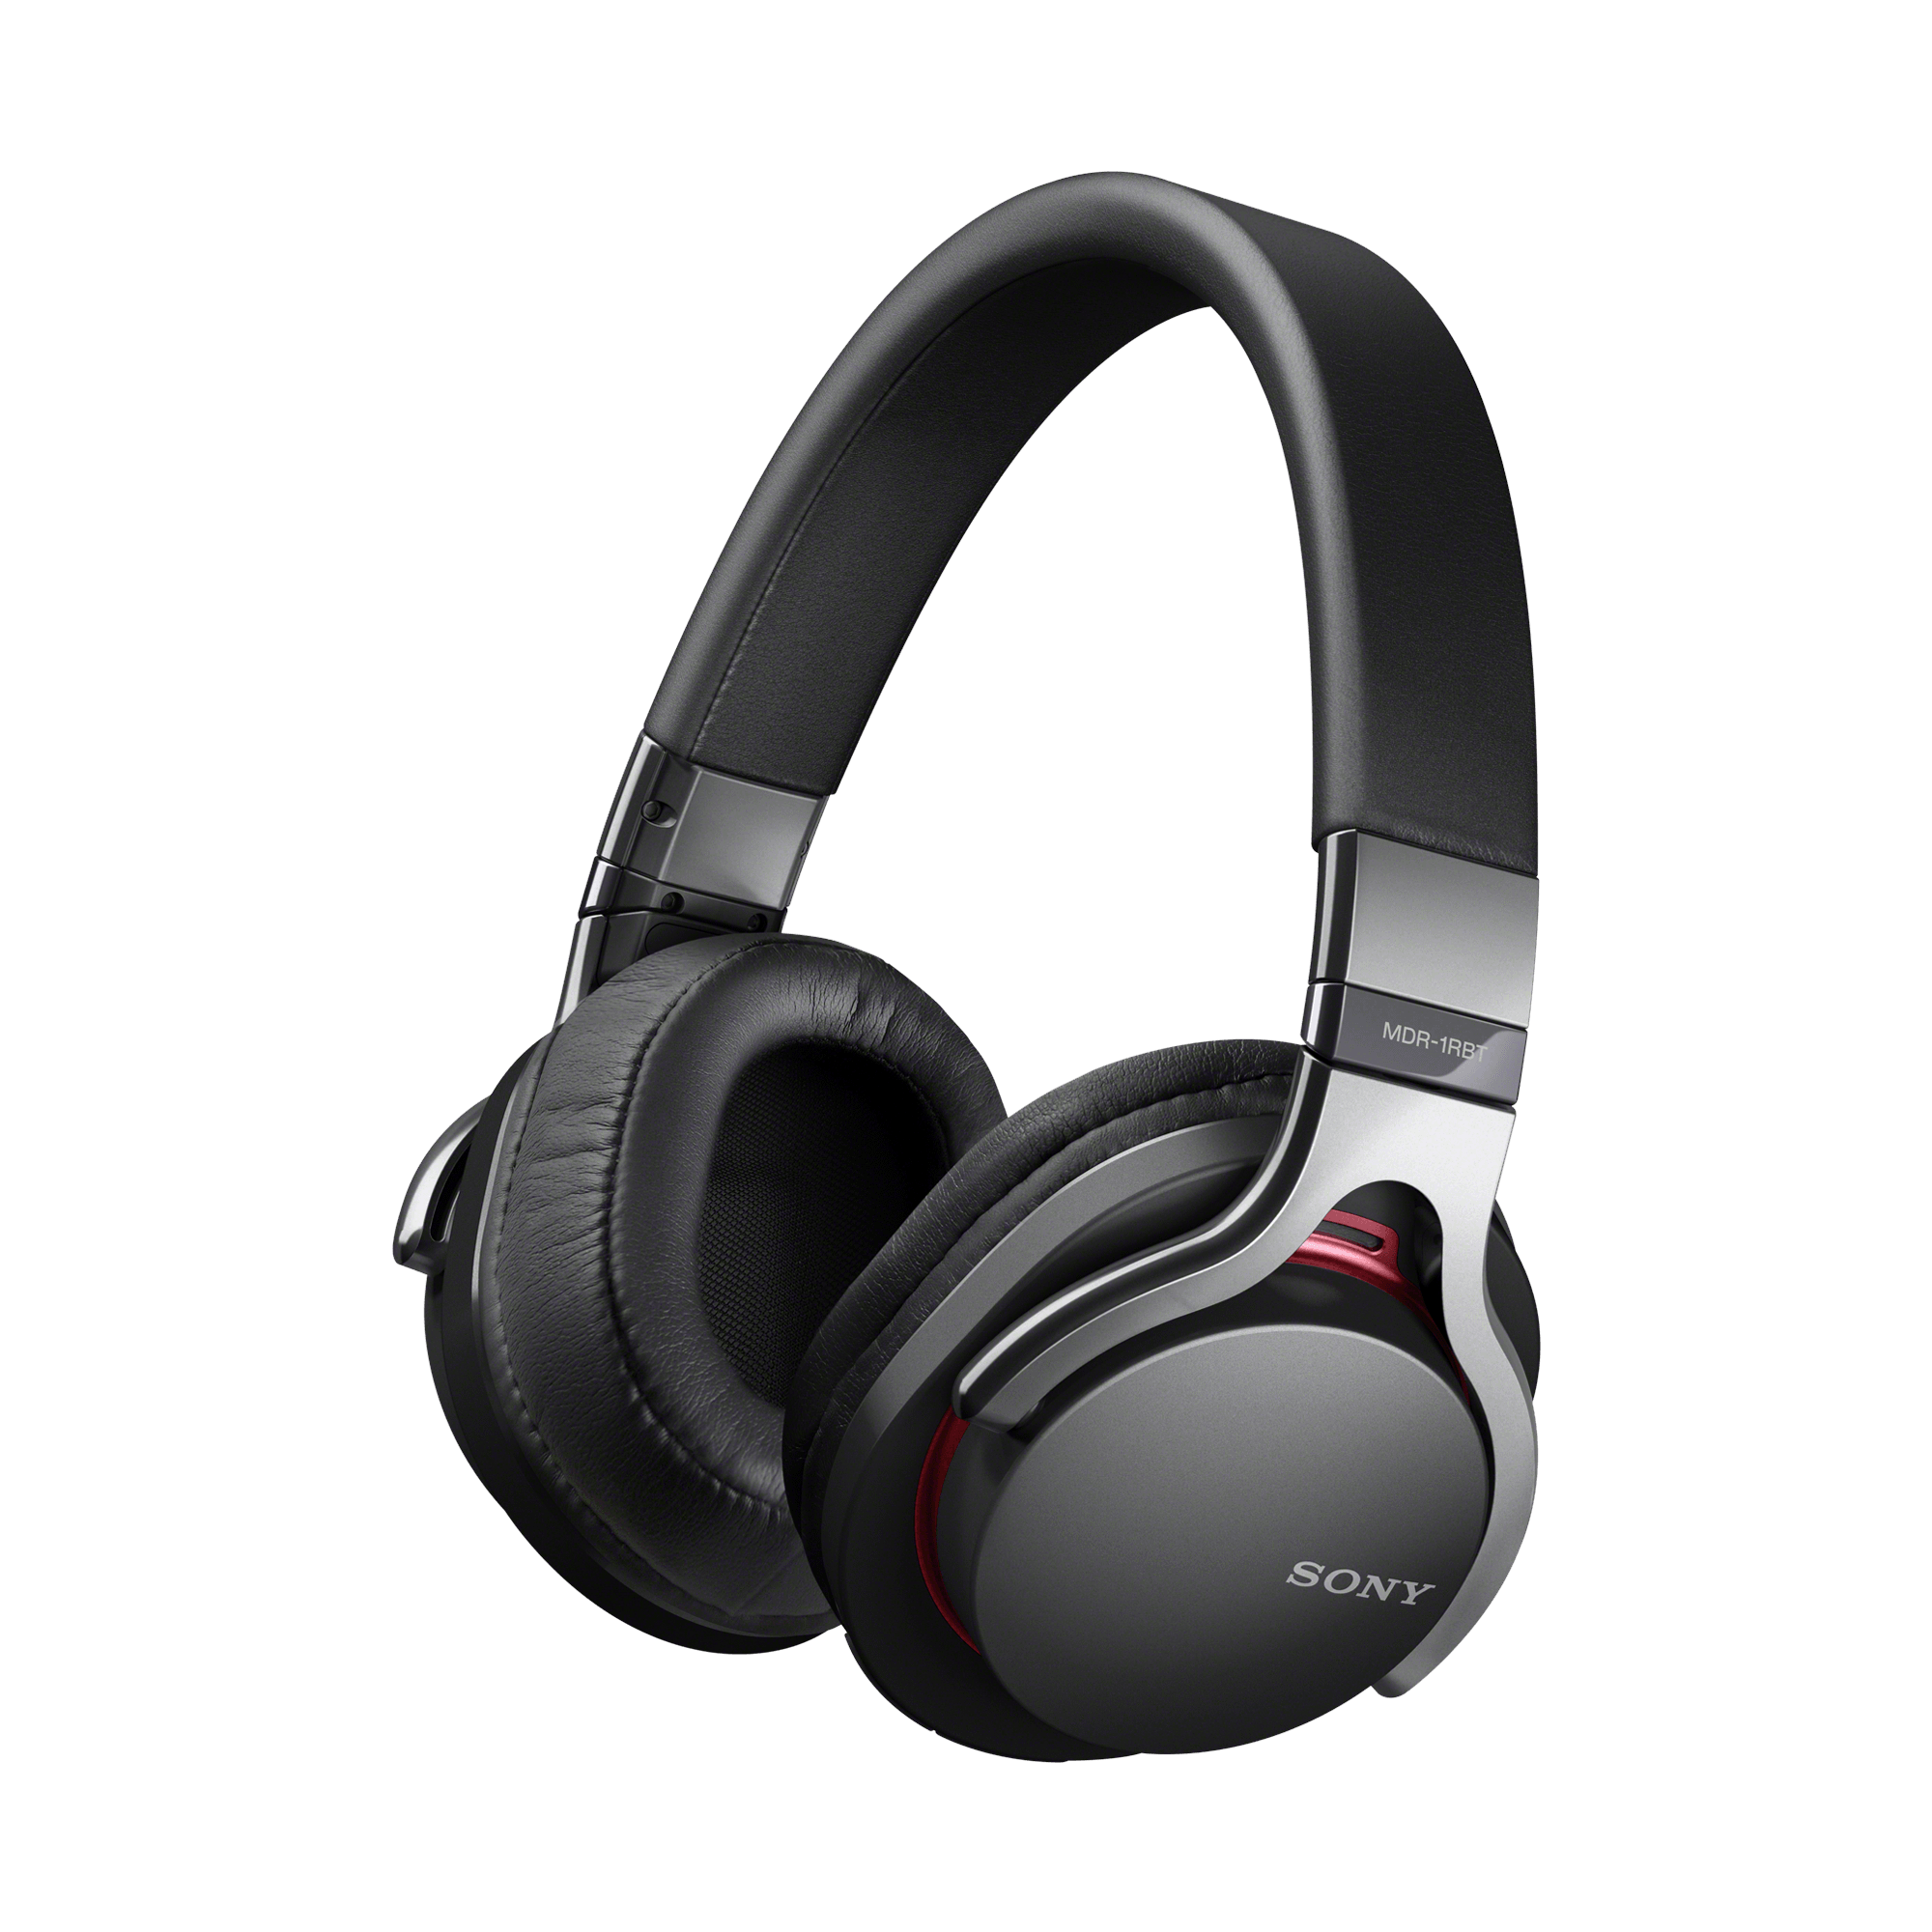 Black Headphones Png Image - Headphones, Transparent background PNG HD thumbnail